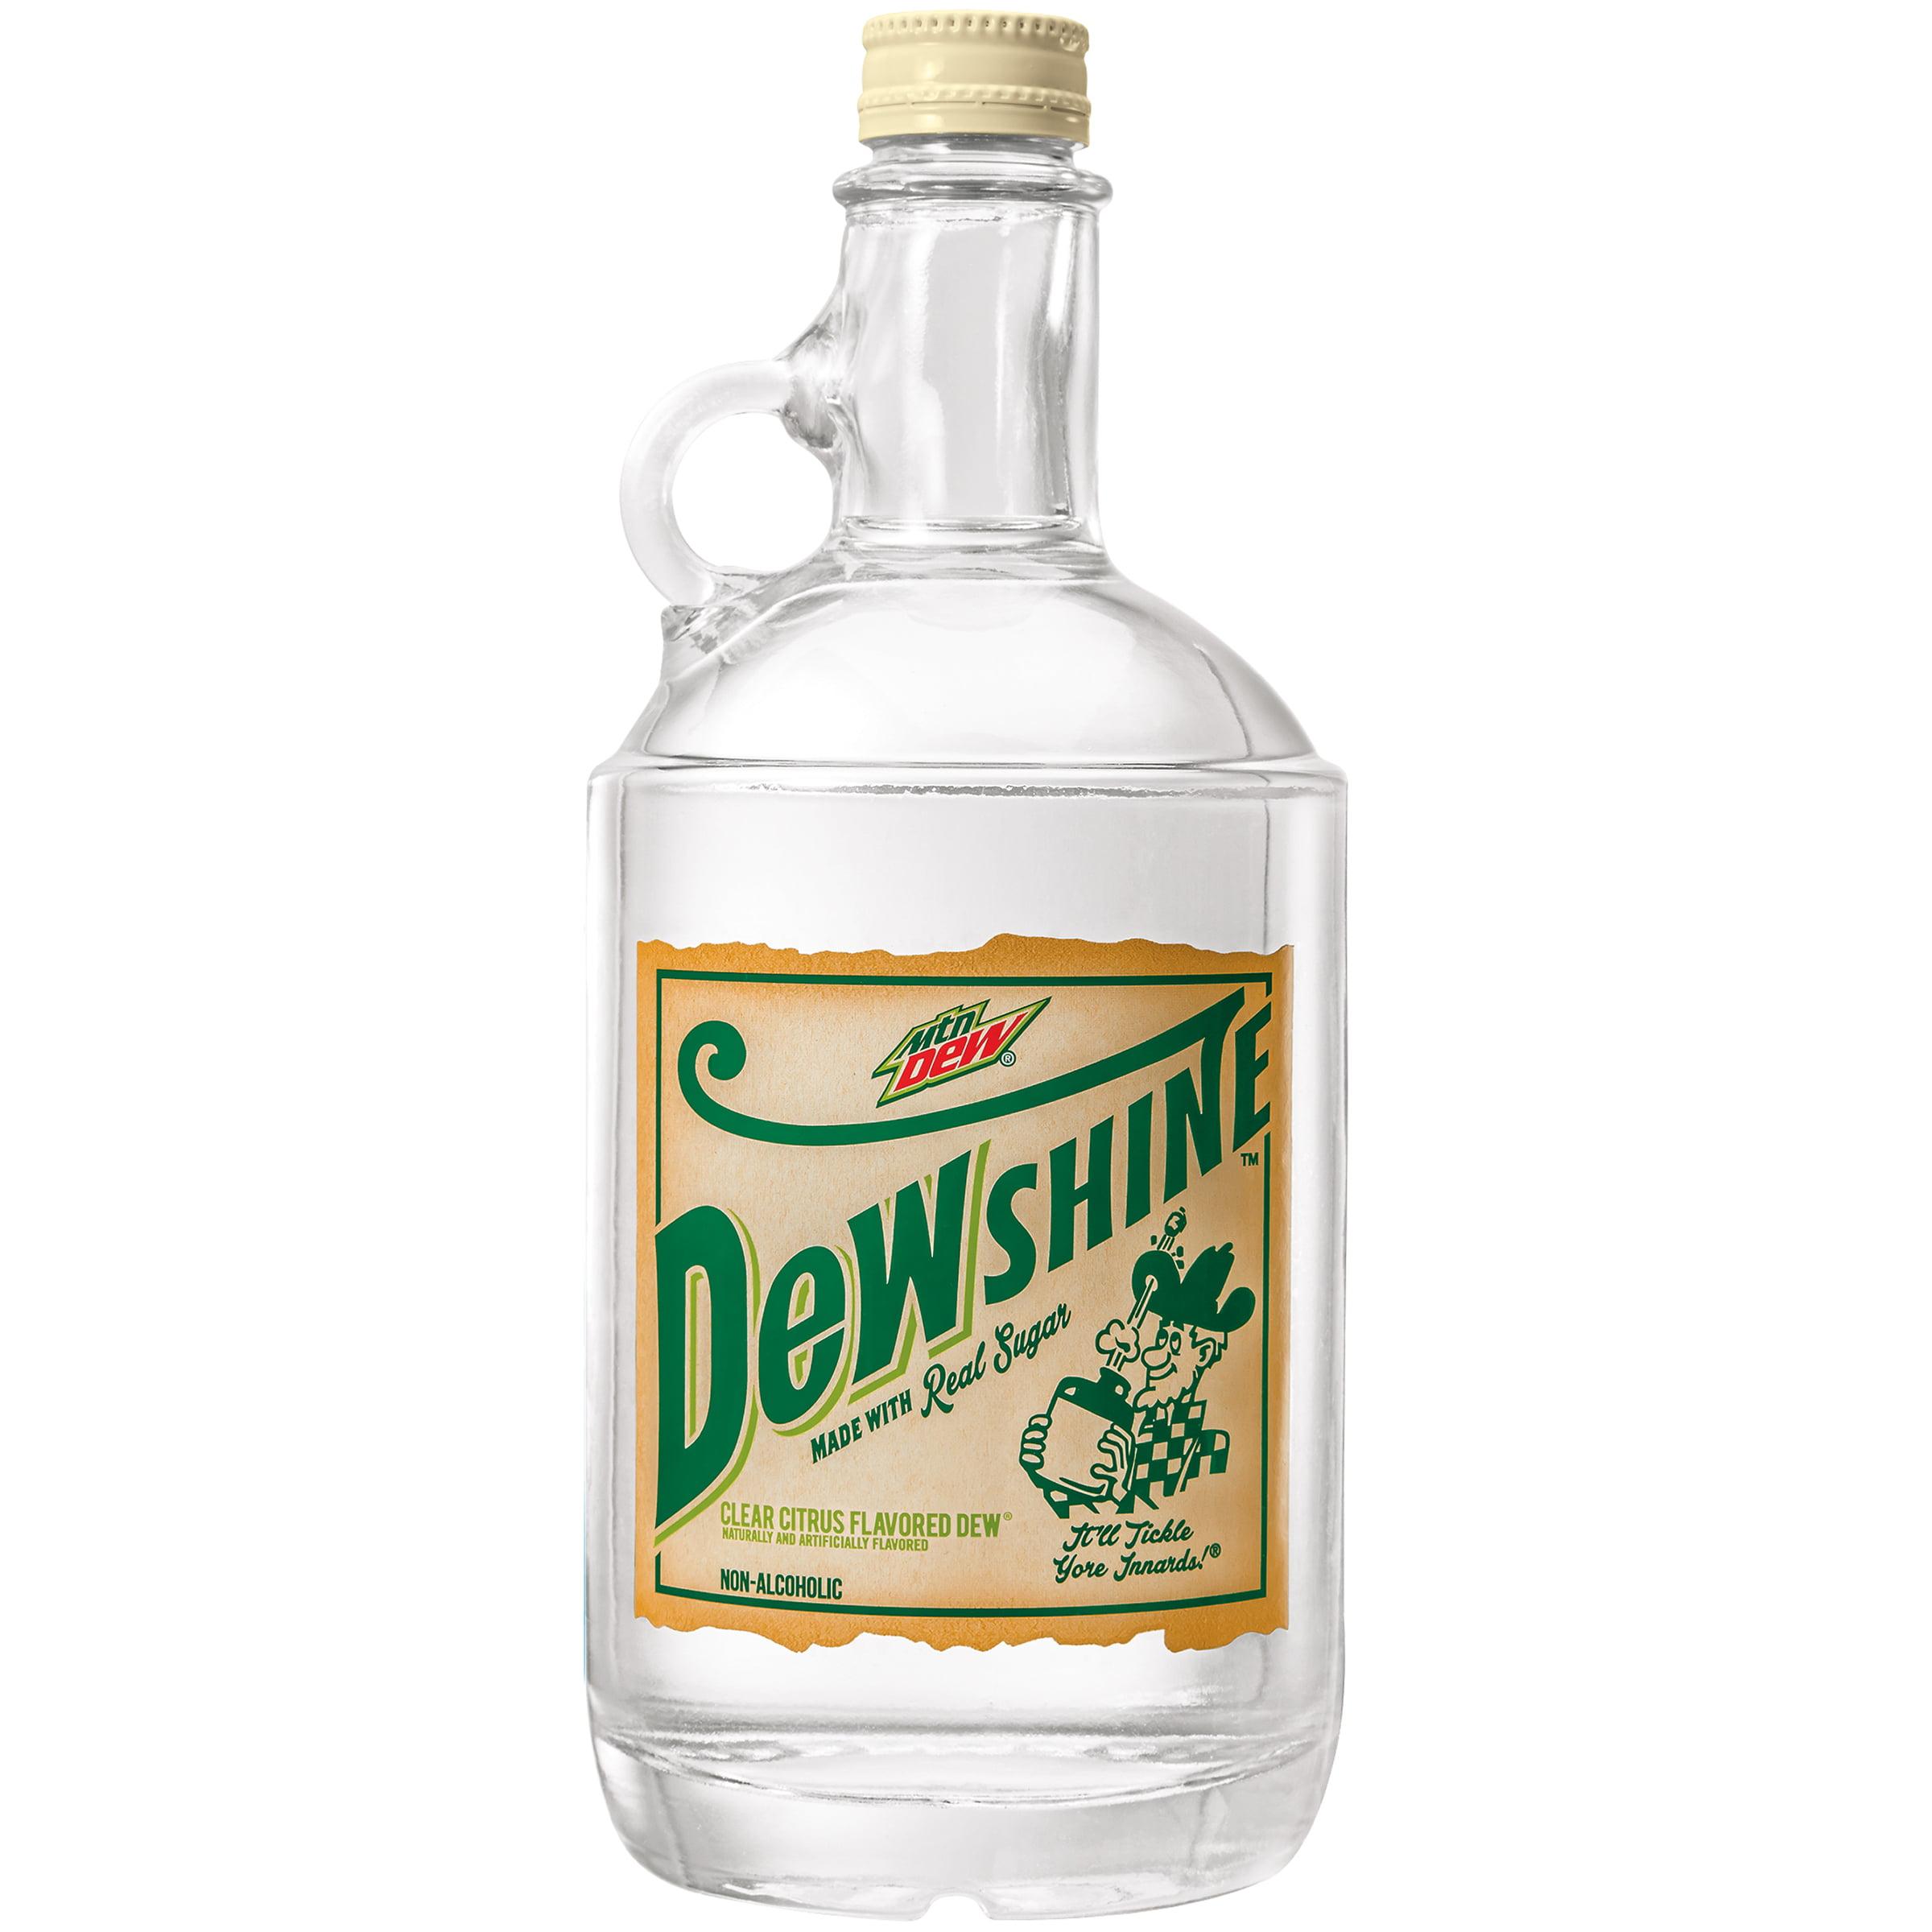 Mountain Dew DewShine Soda 25 fl. oz. Bottle - Walmart.com ...